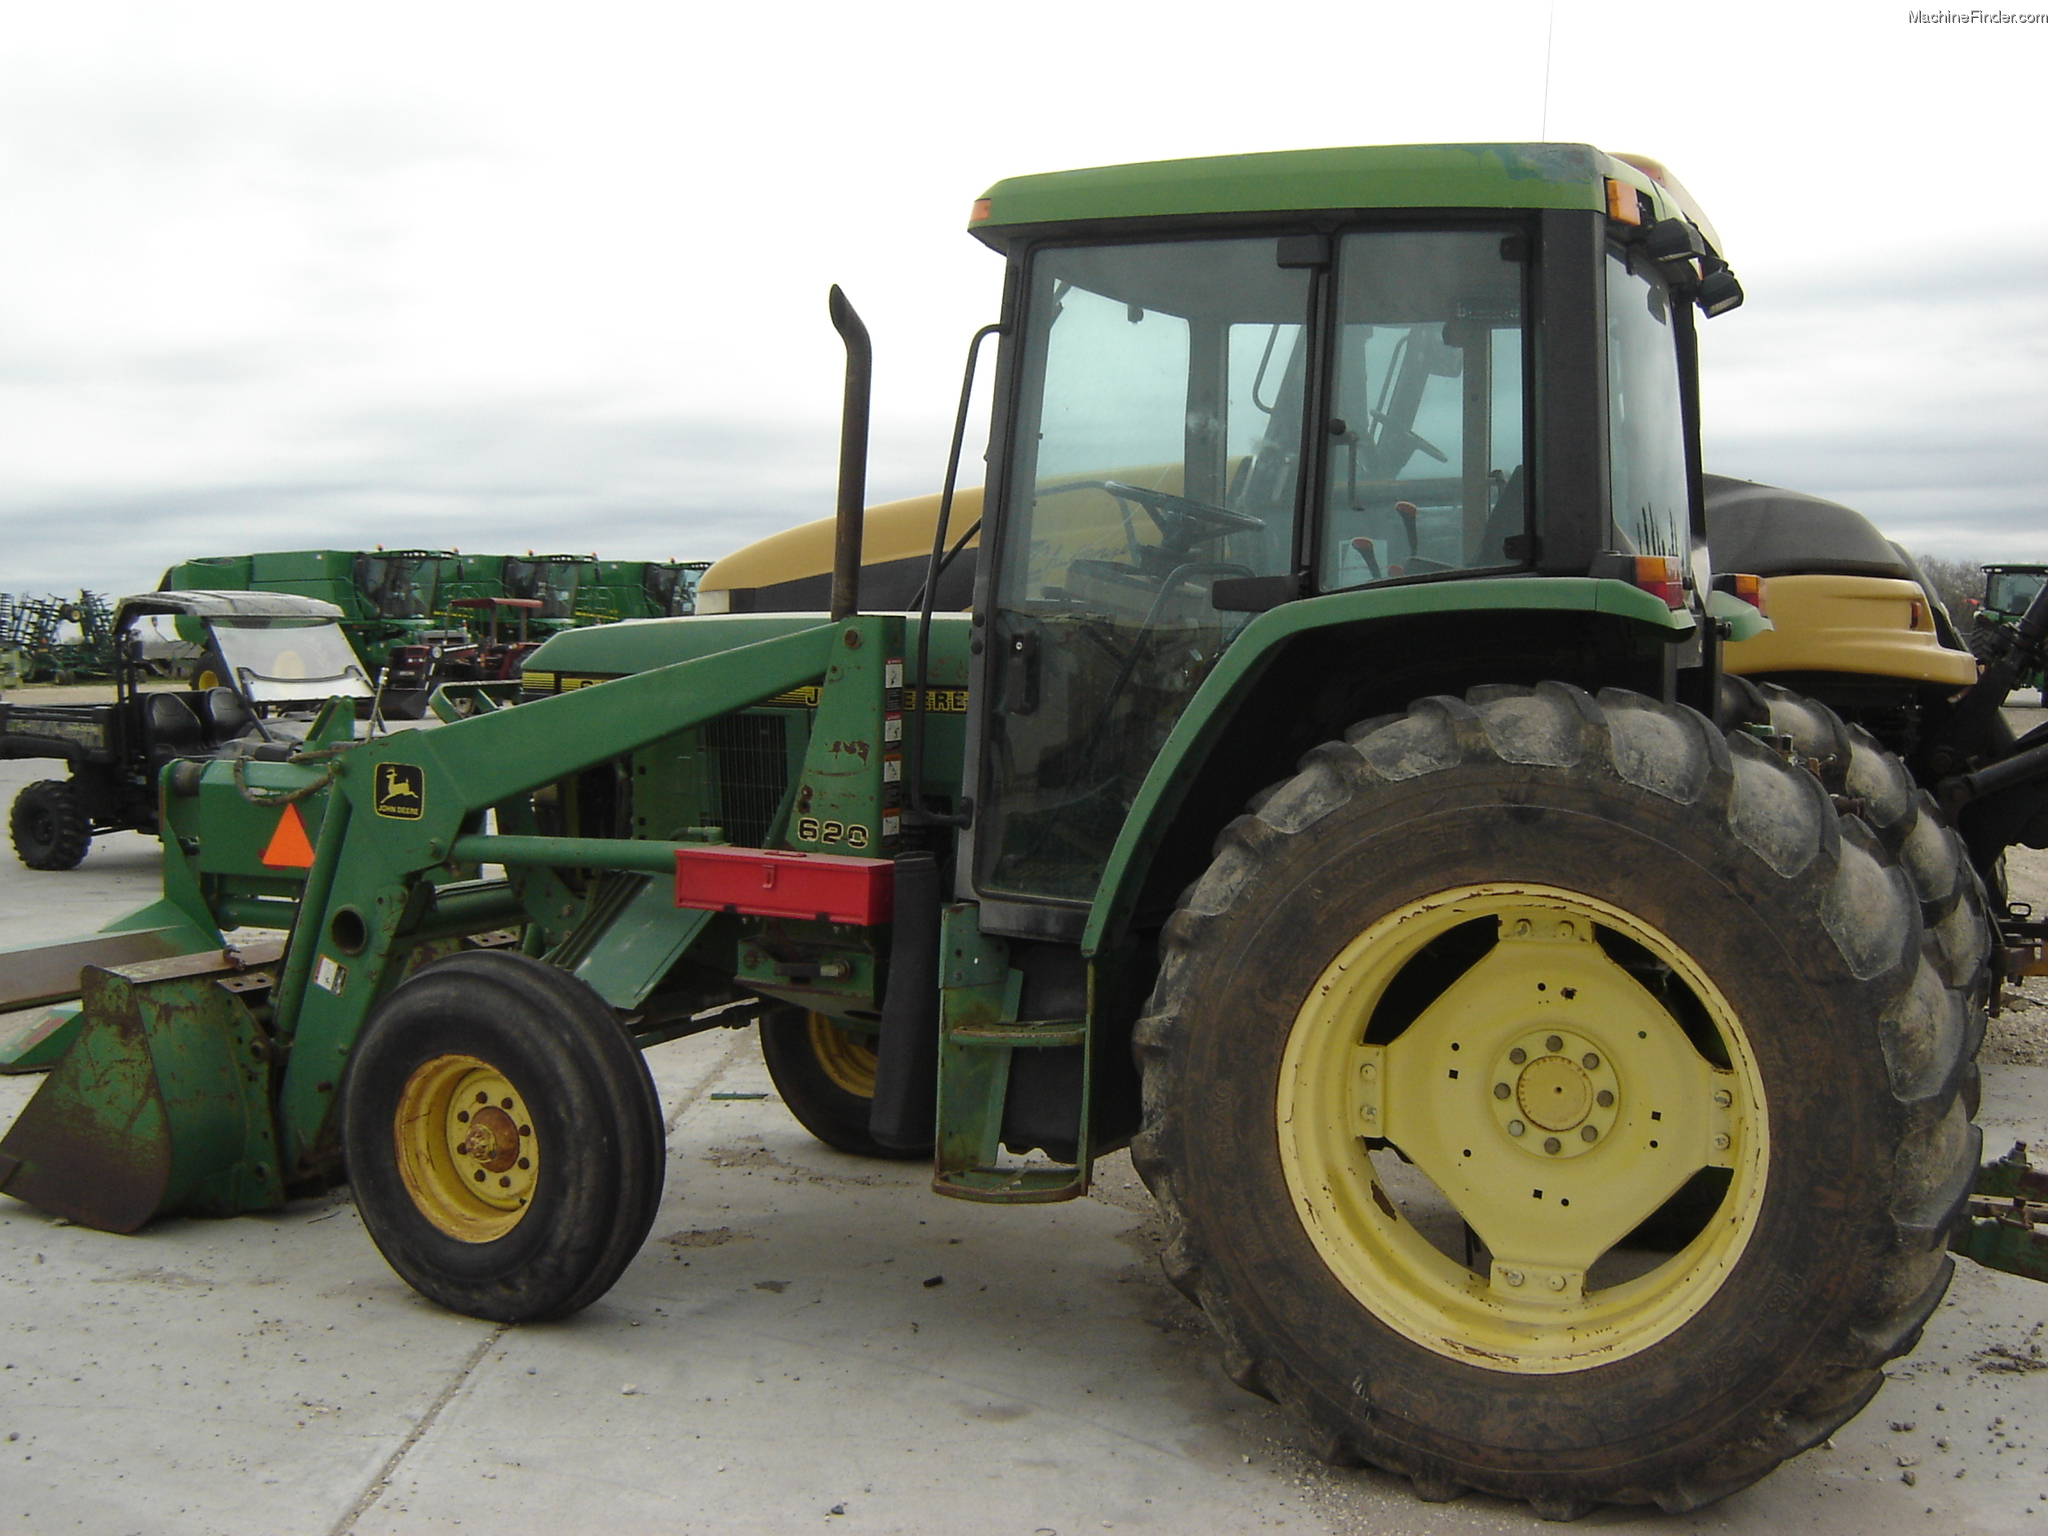 1996 John Deere 6400 Tractors - Utility (40-100hp) - John ...